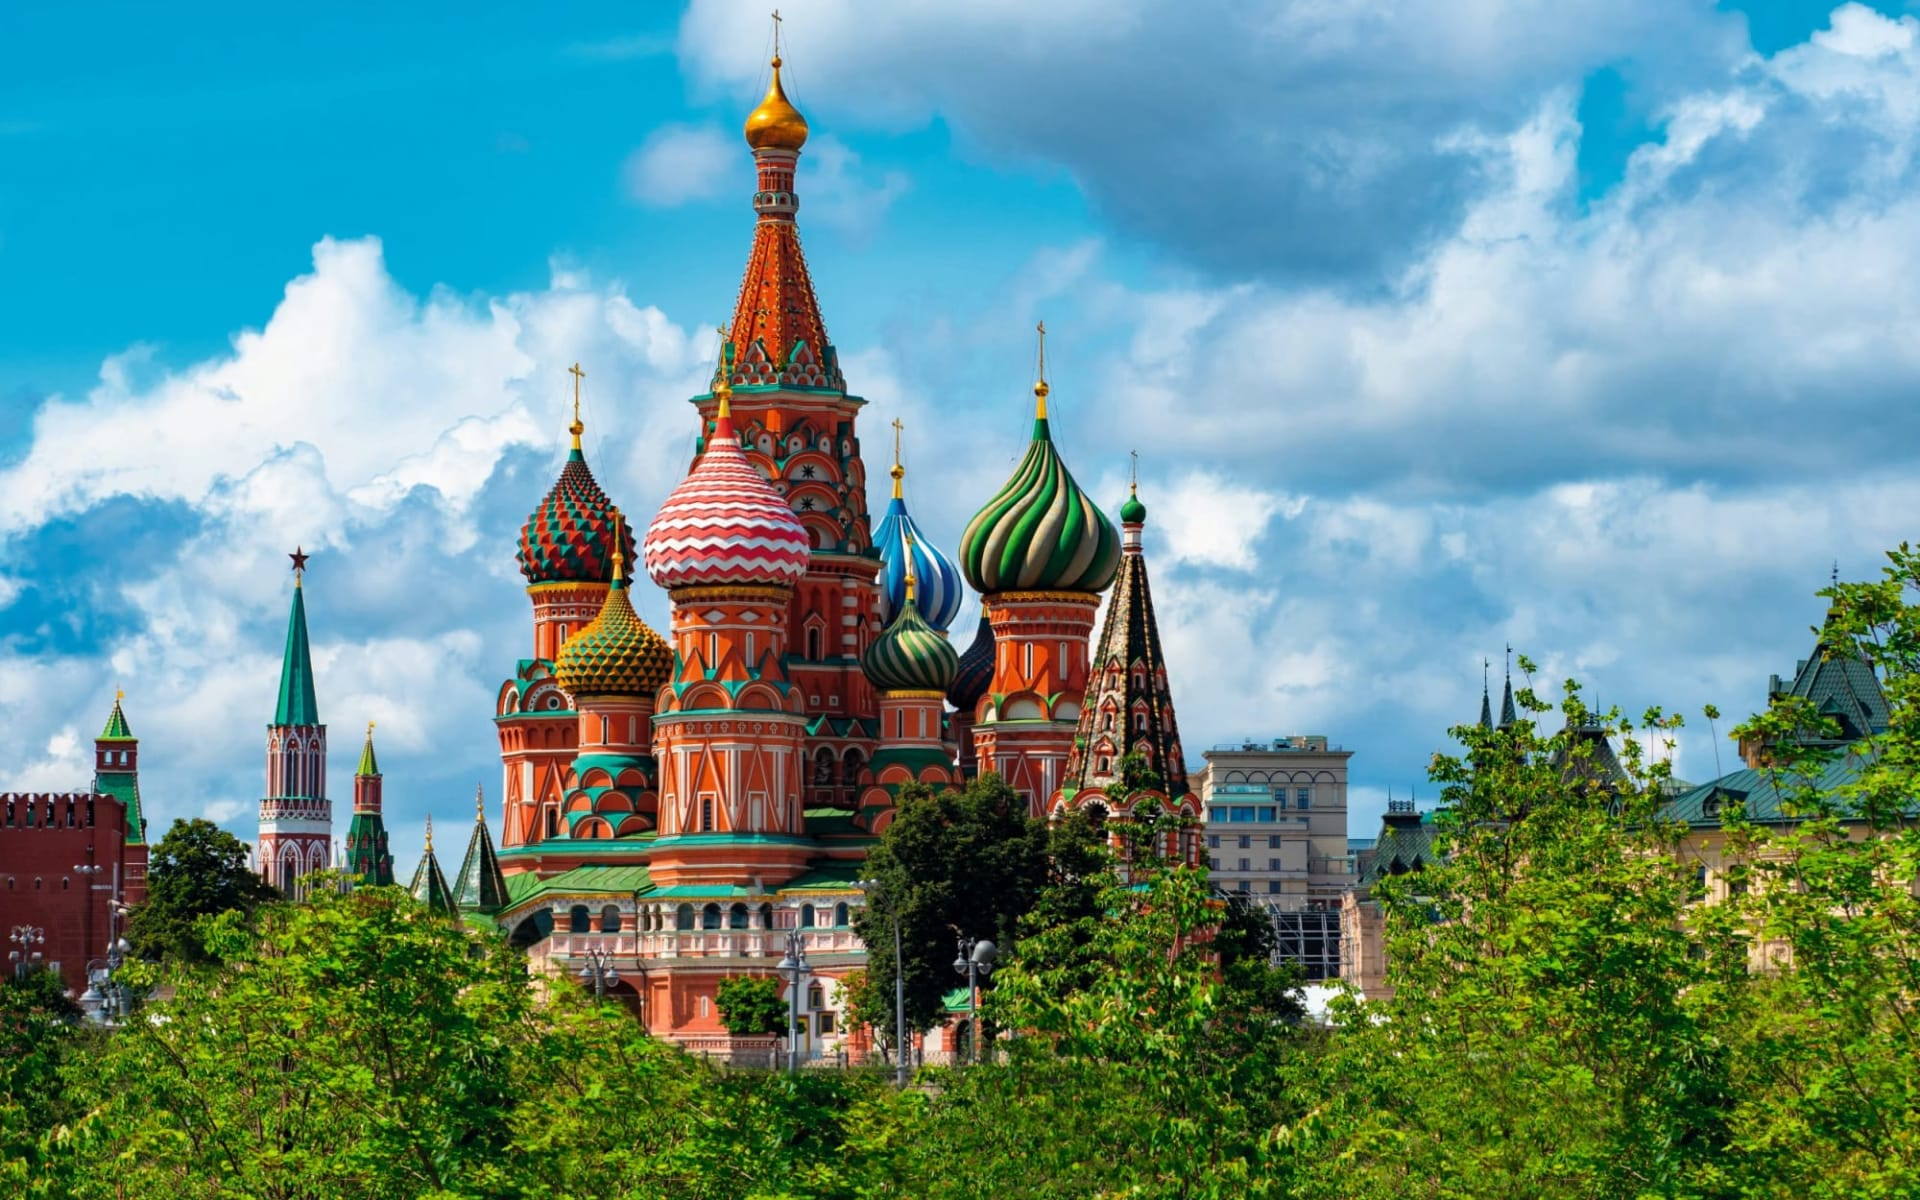 Leserreise Luzerner Zeitung Kulturreise Moskau & St. Petersburg: Russlan_Moskau_BasiliusKathedrale_